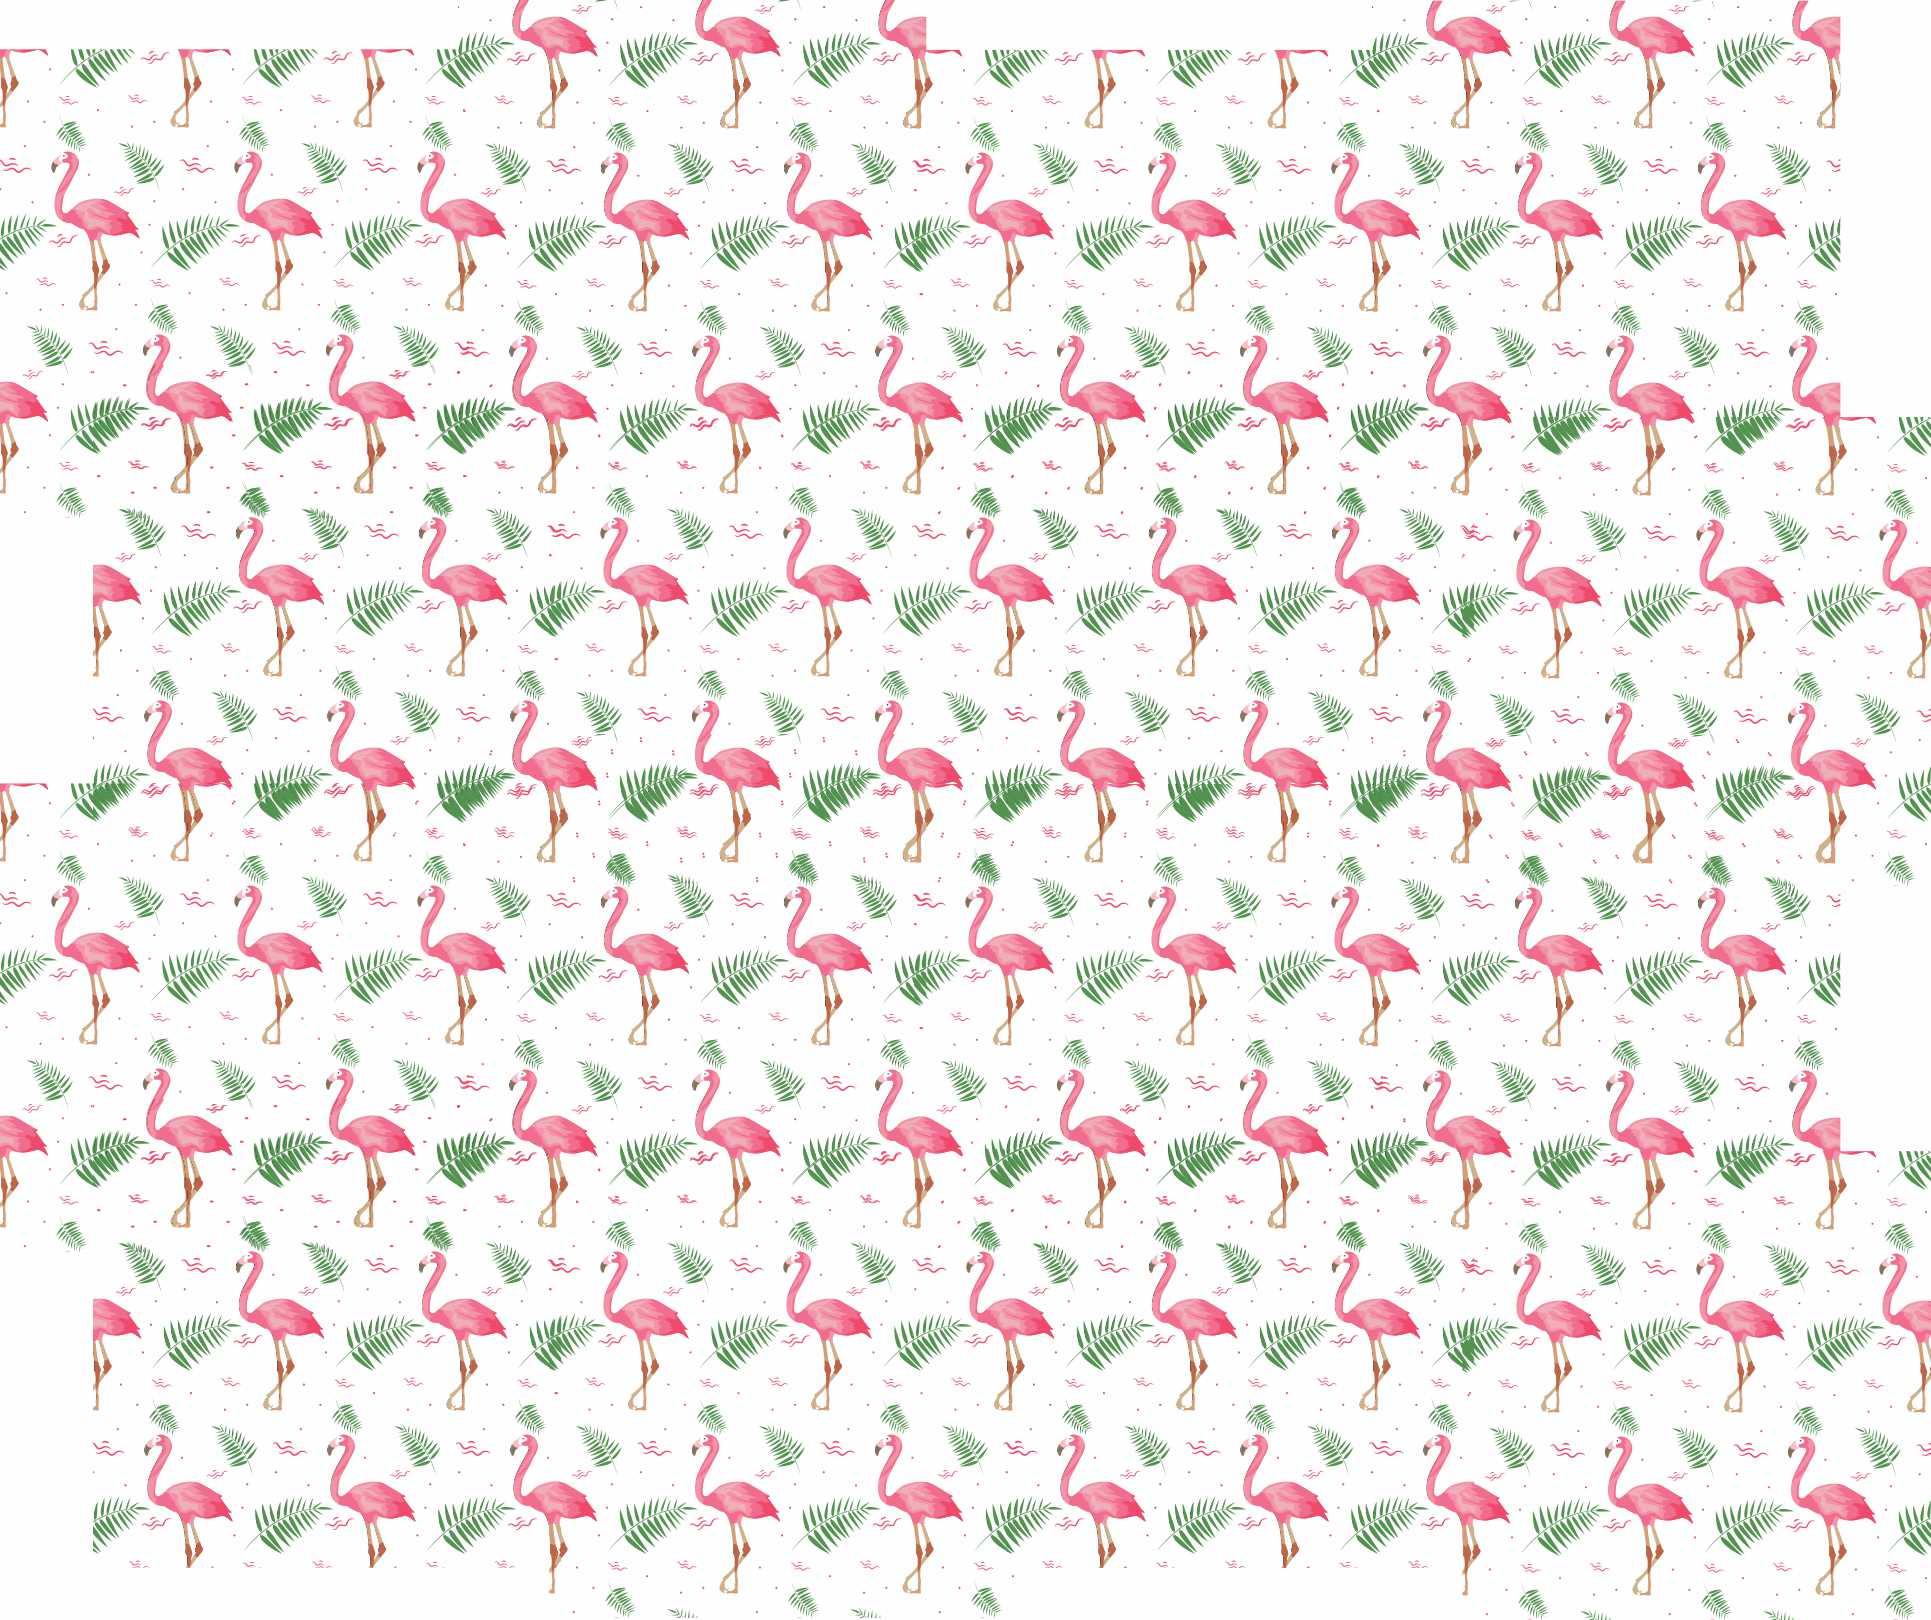 Papel de Parede Autocolante Flamingo Fundo Branco